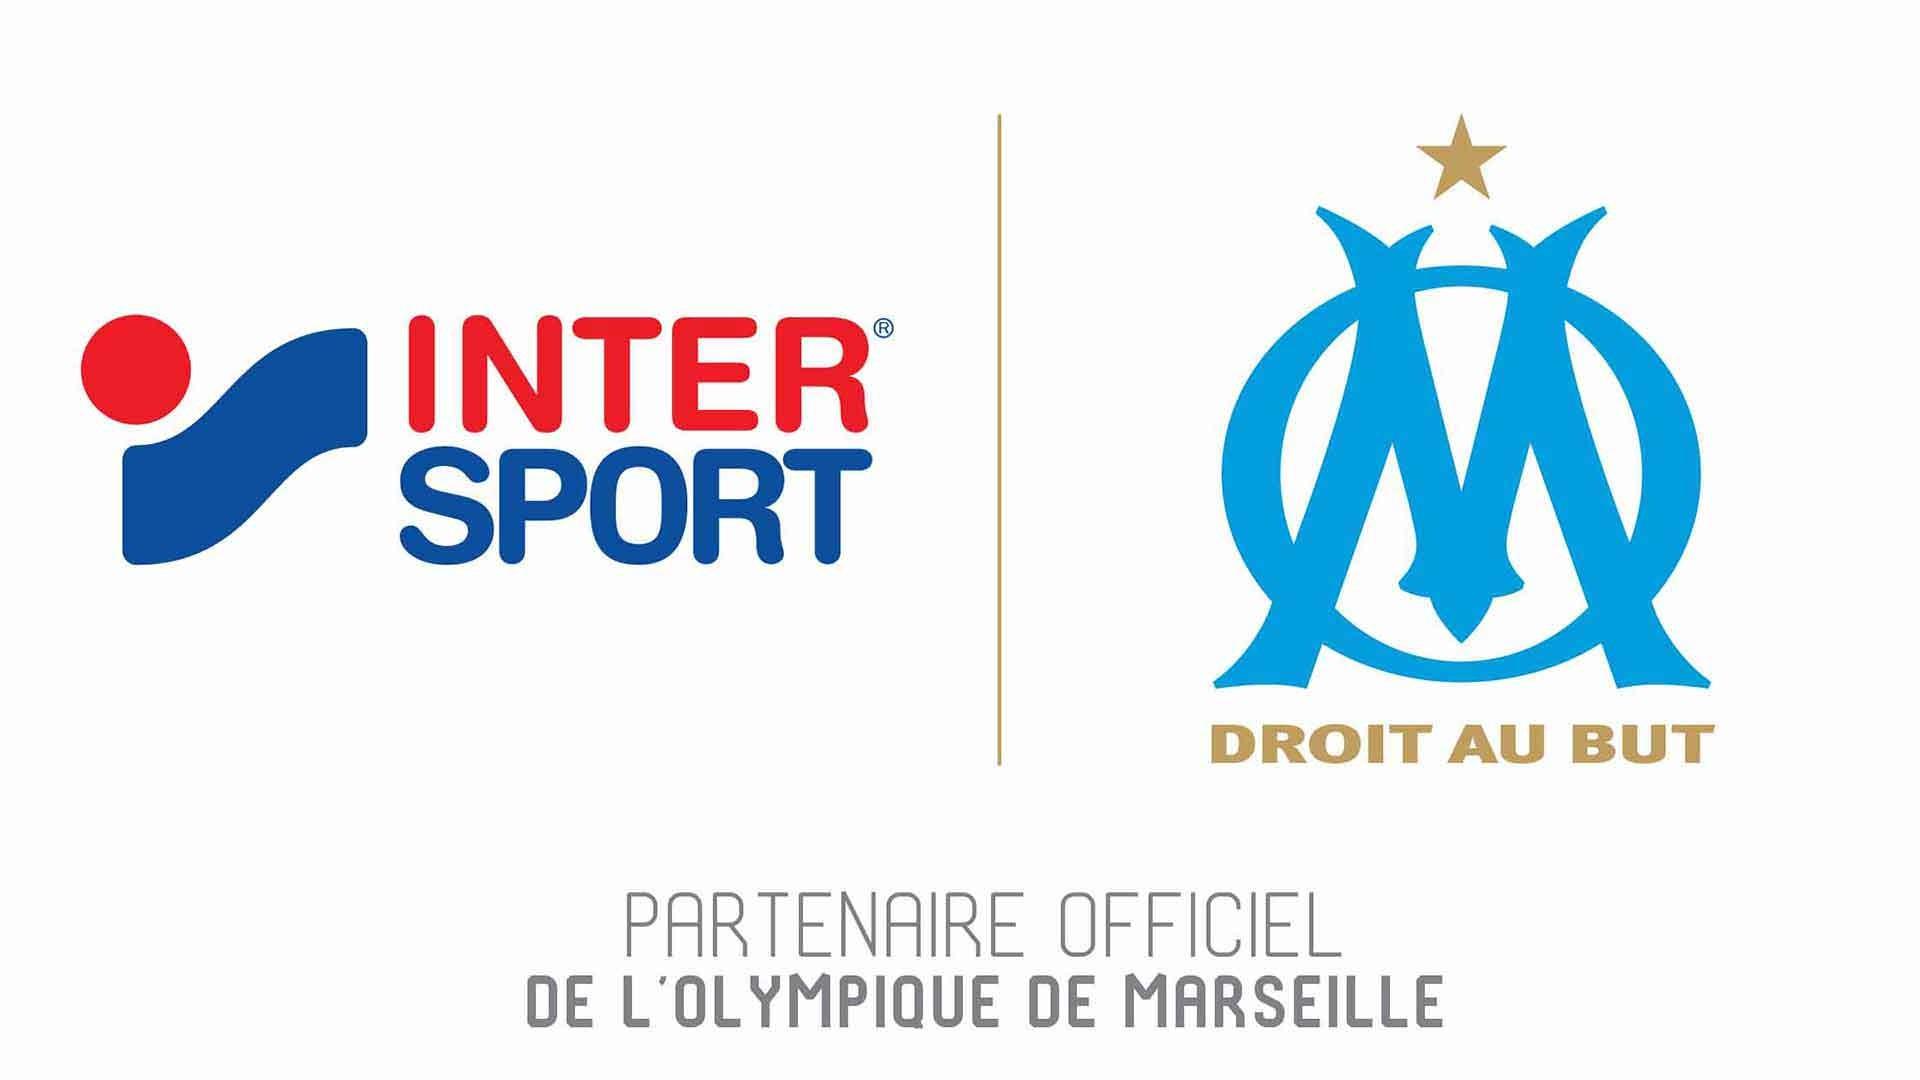 Intersport x OM Olympique de Marseille (football) 2020